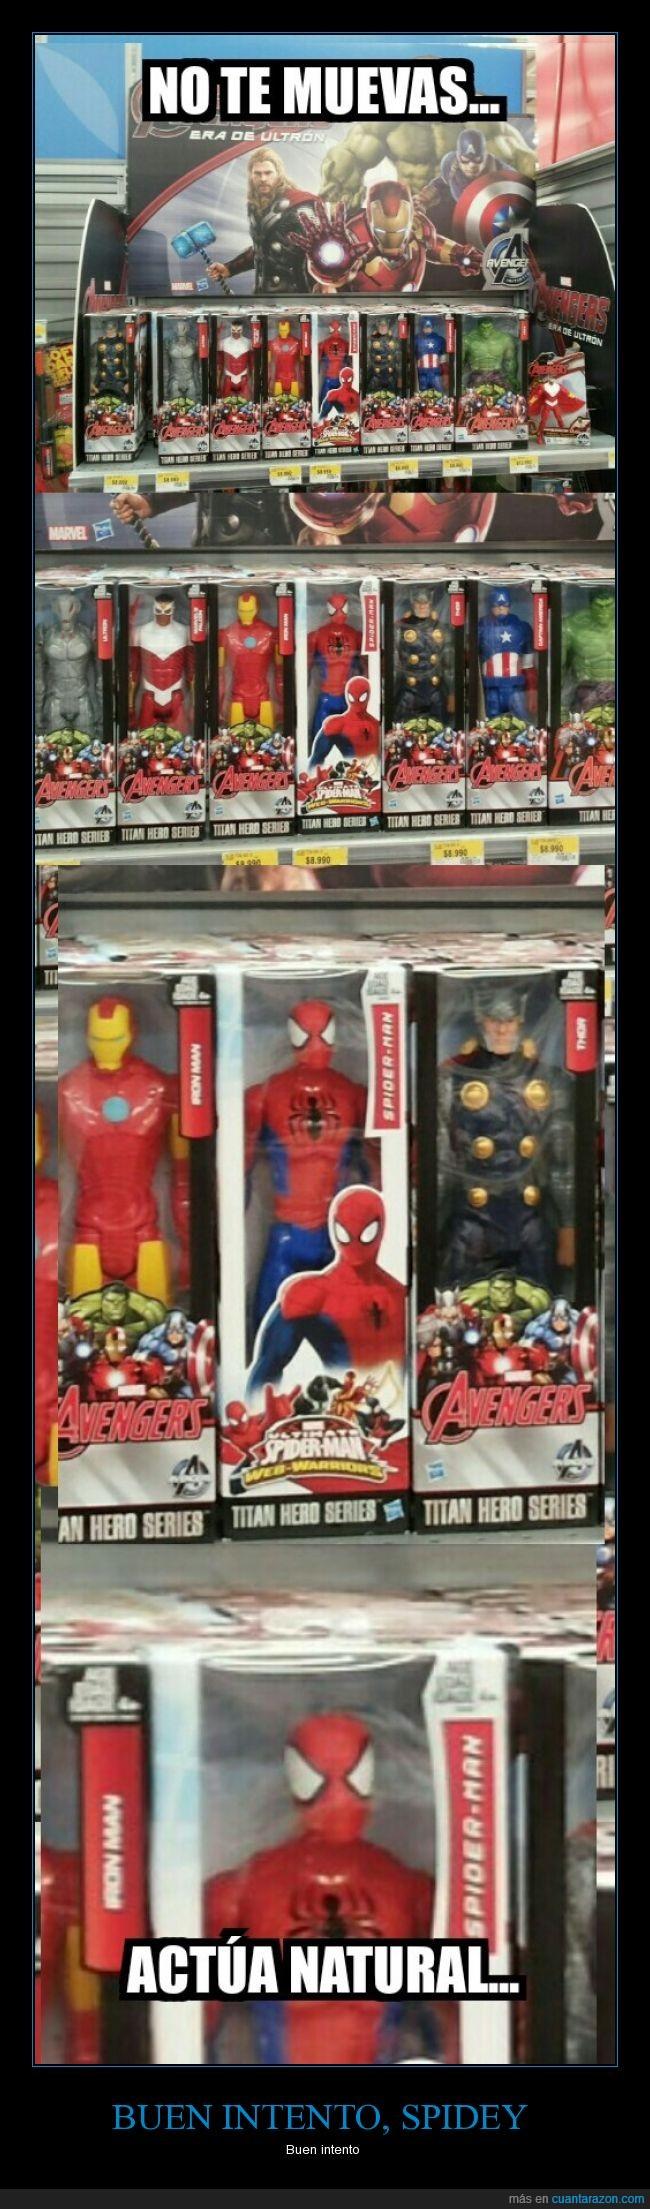 avengers,caja,colar,disimular,estantería,heroe,Man,mezclar,Spiderman,súperhéroes